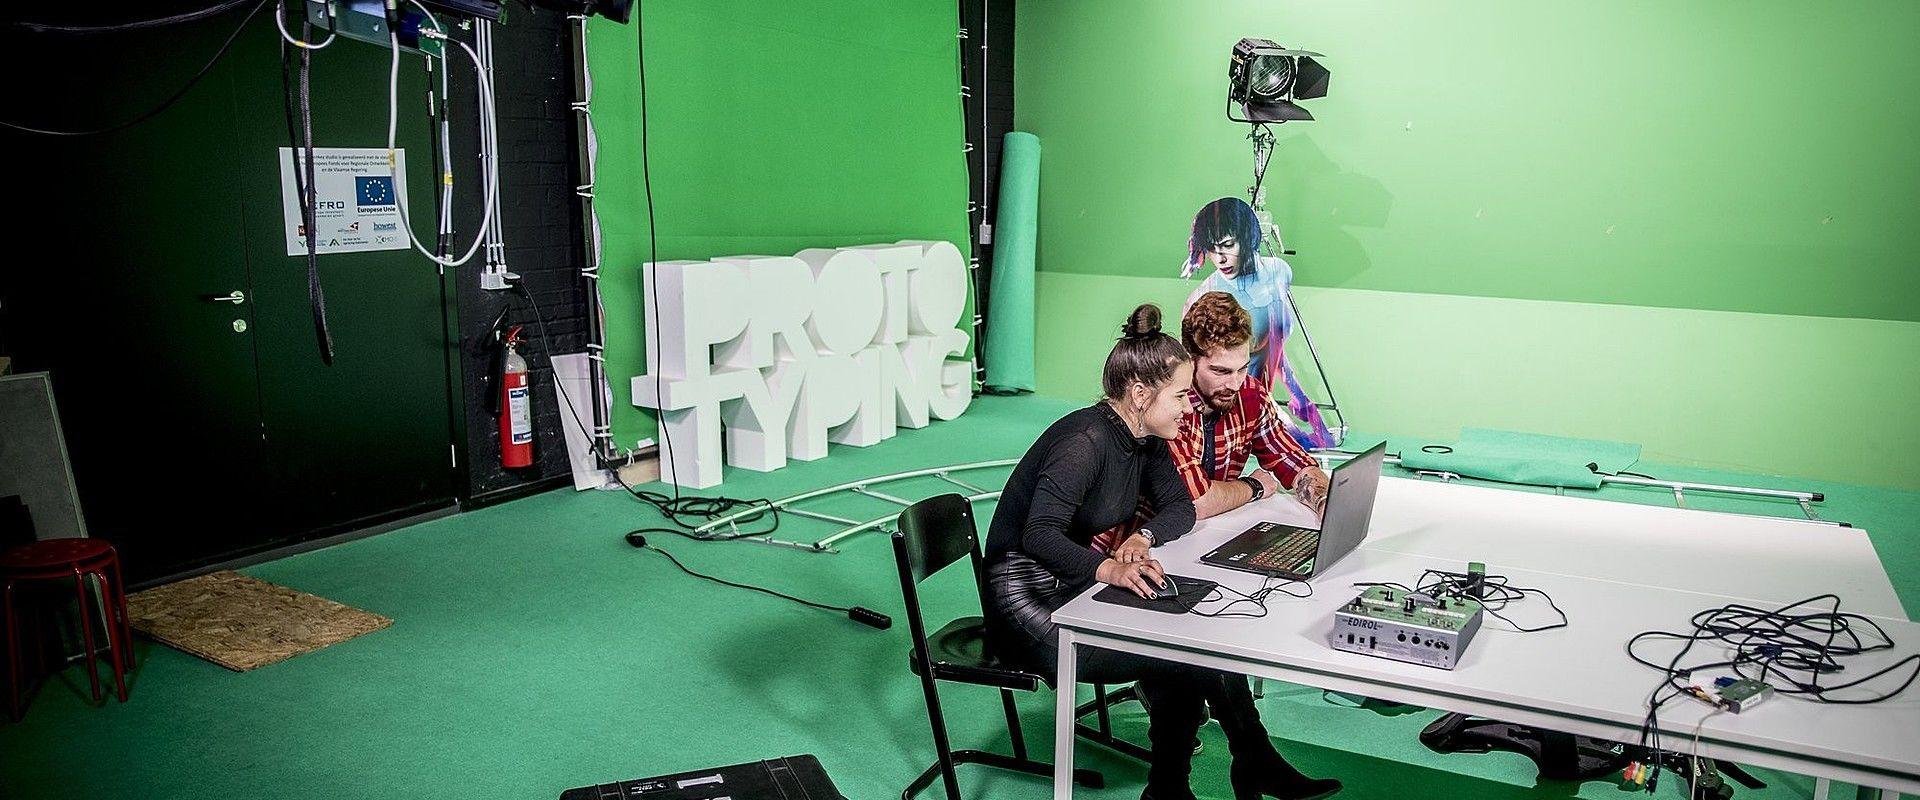 Digital Arts and Entertainment (DAE)